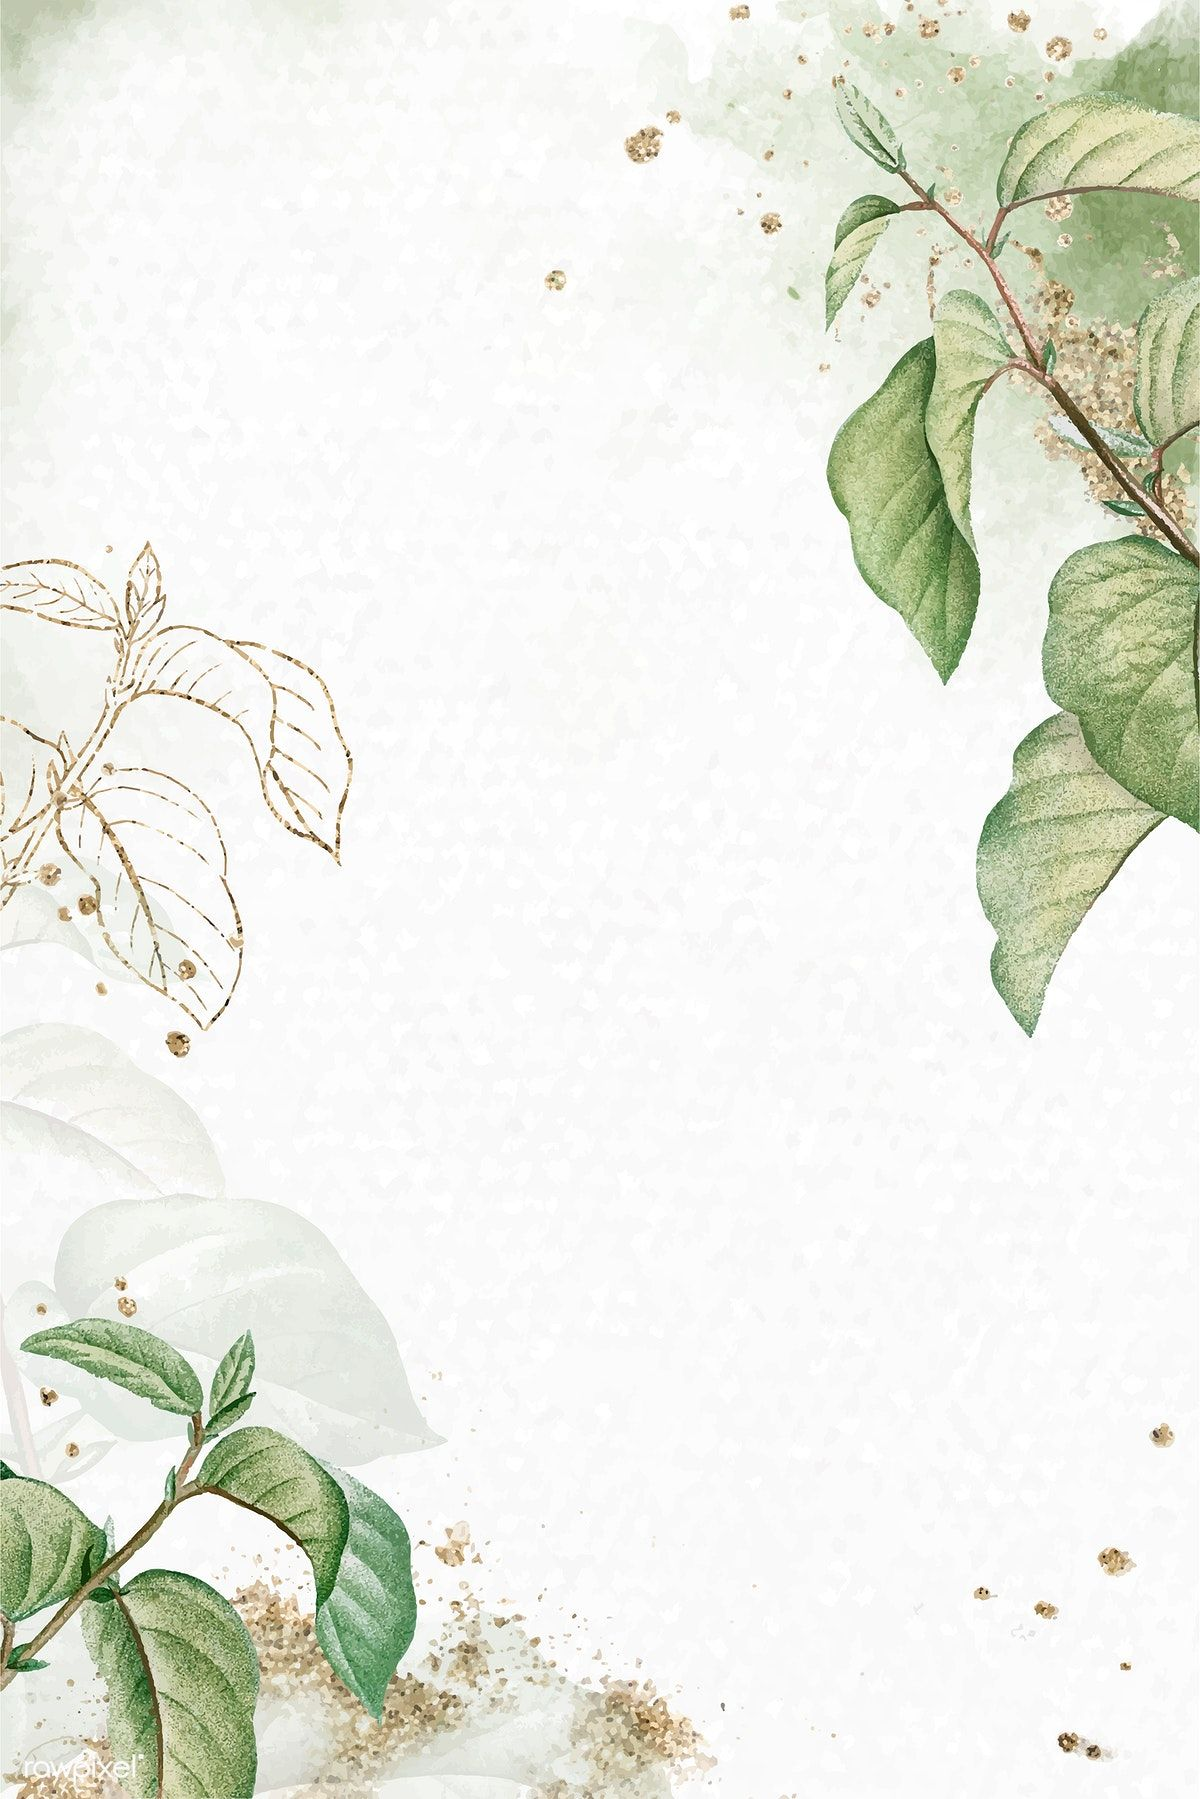 Briançon apricot leaf pattern background vector | premium image by rawpixel.com / Aum